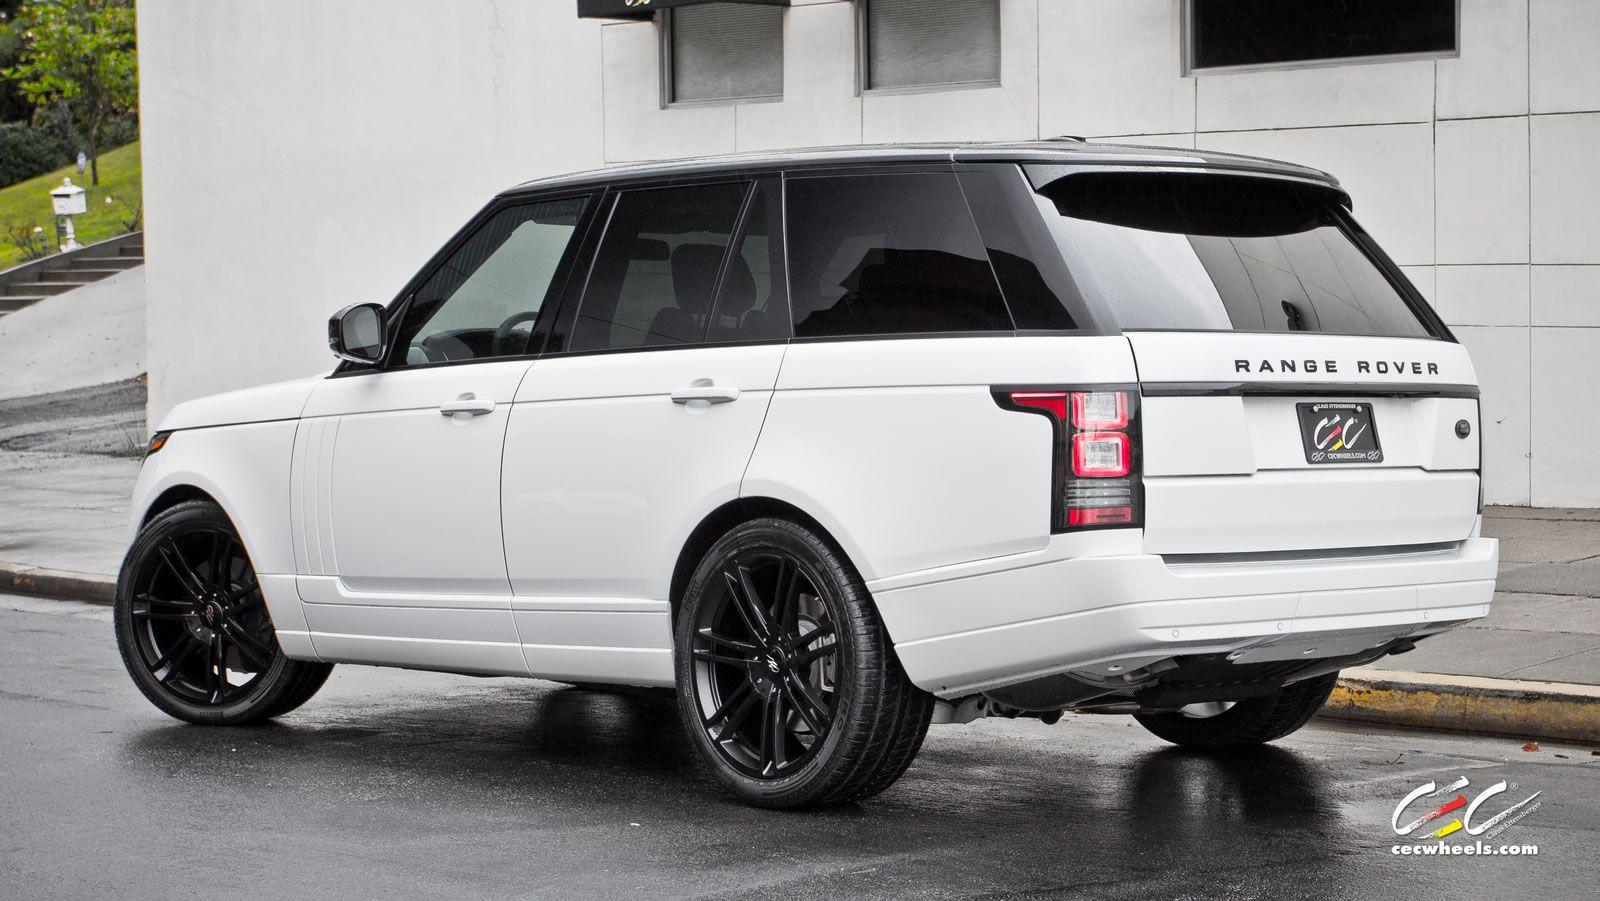 range rover sport 2013 white with black rims. Black Bedroom Furniture Sets. Home Design Ideas